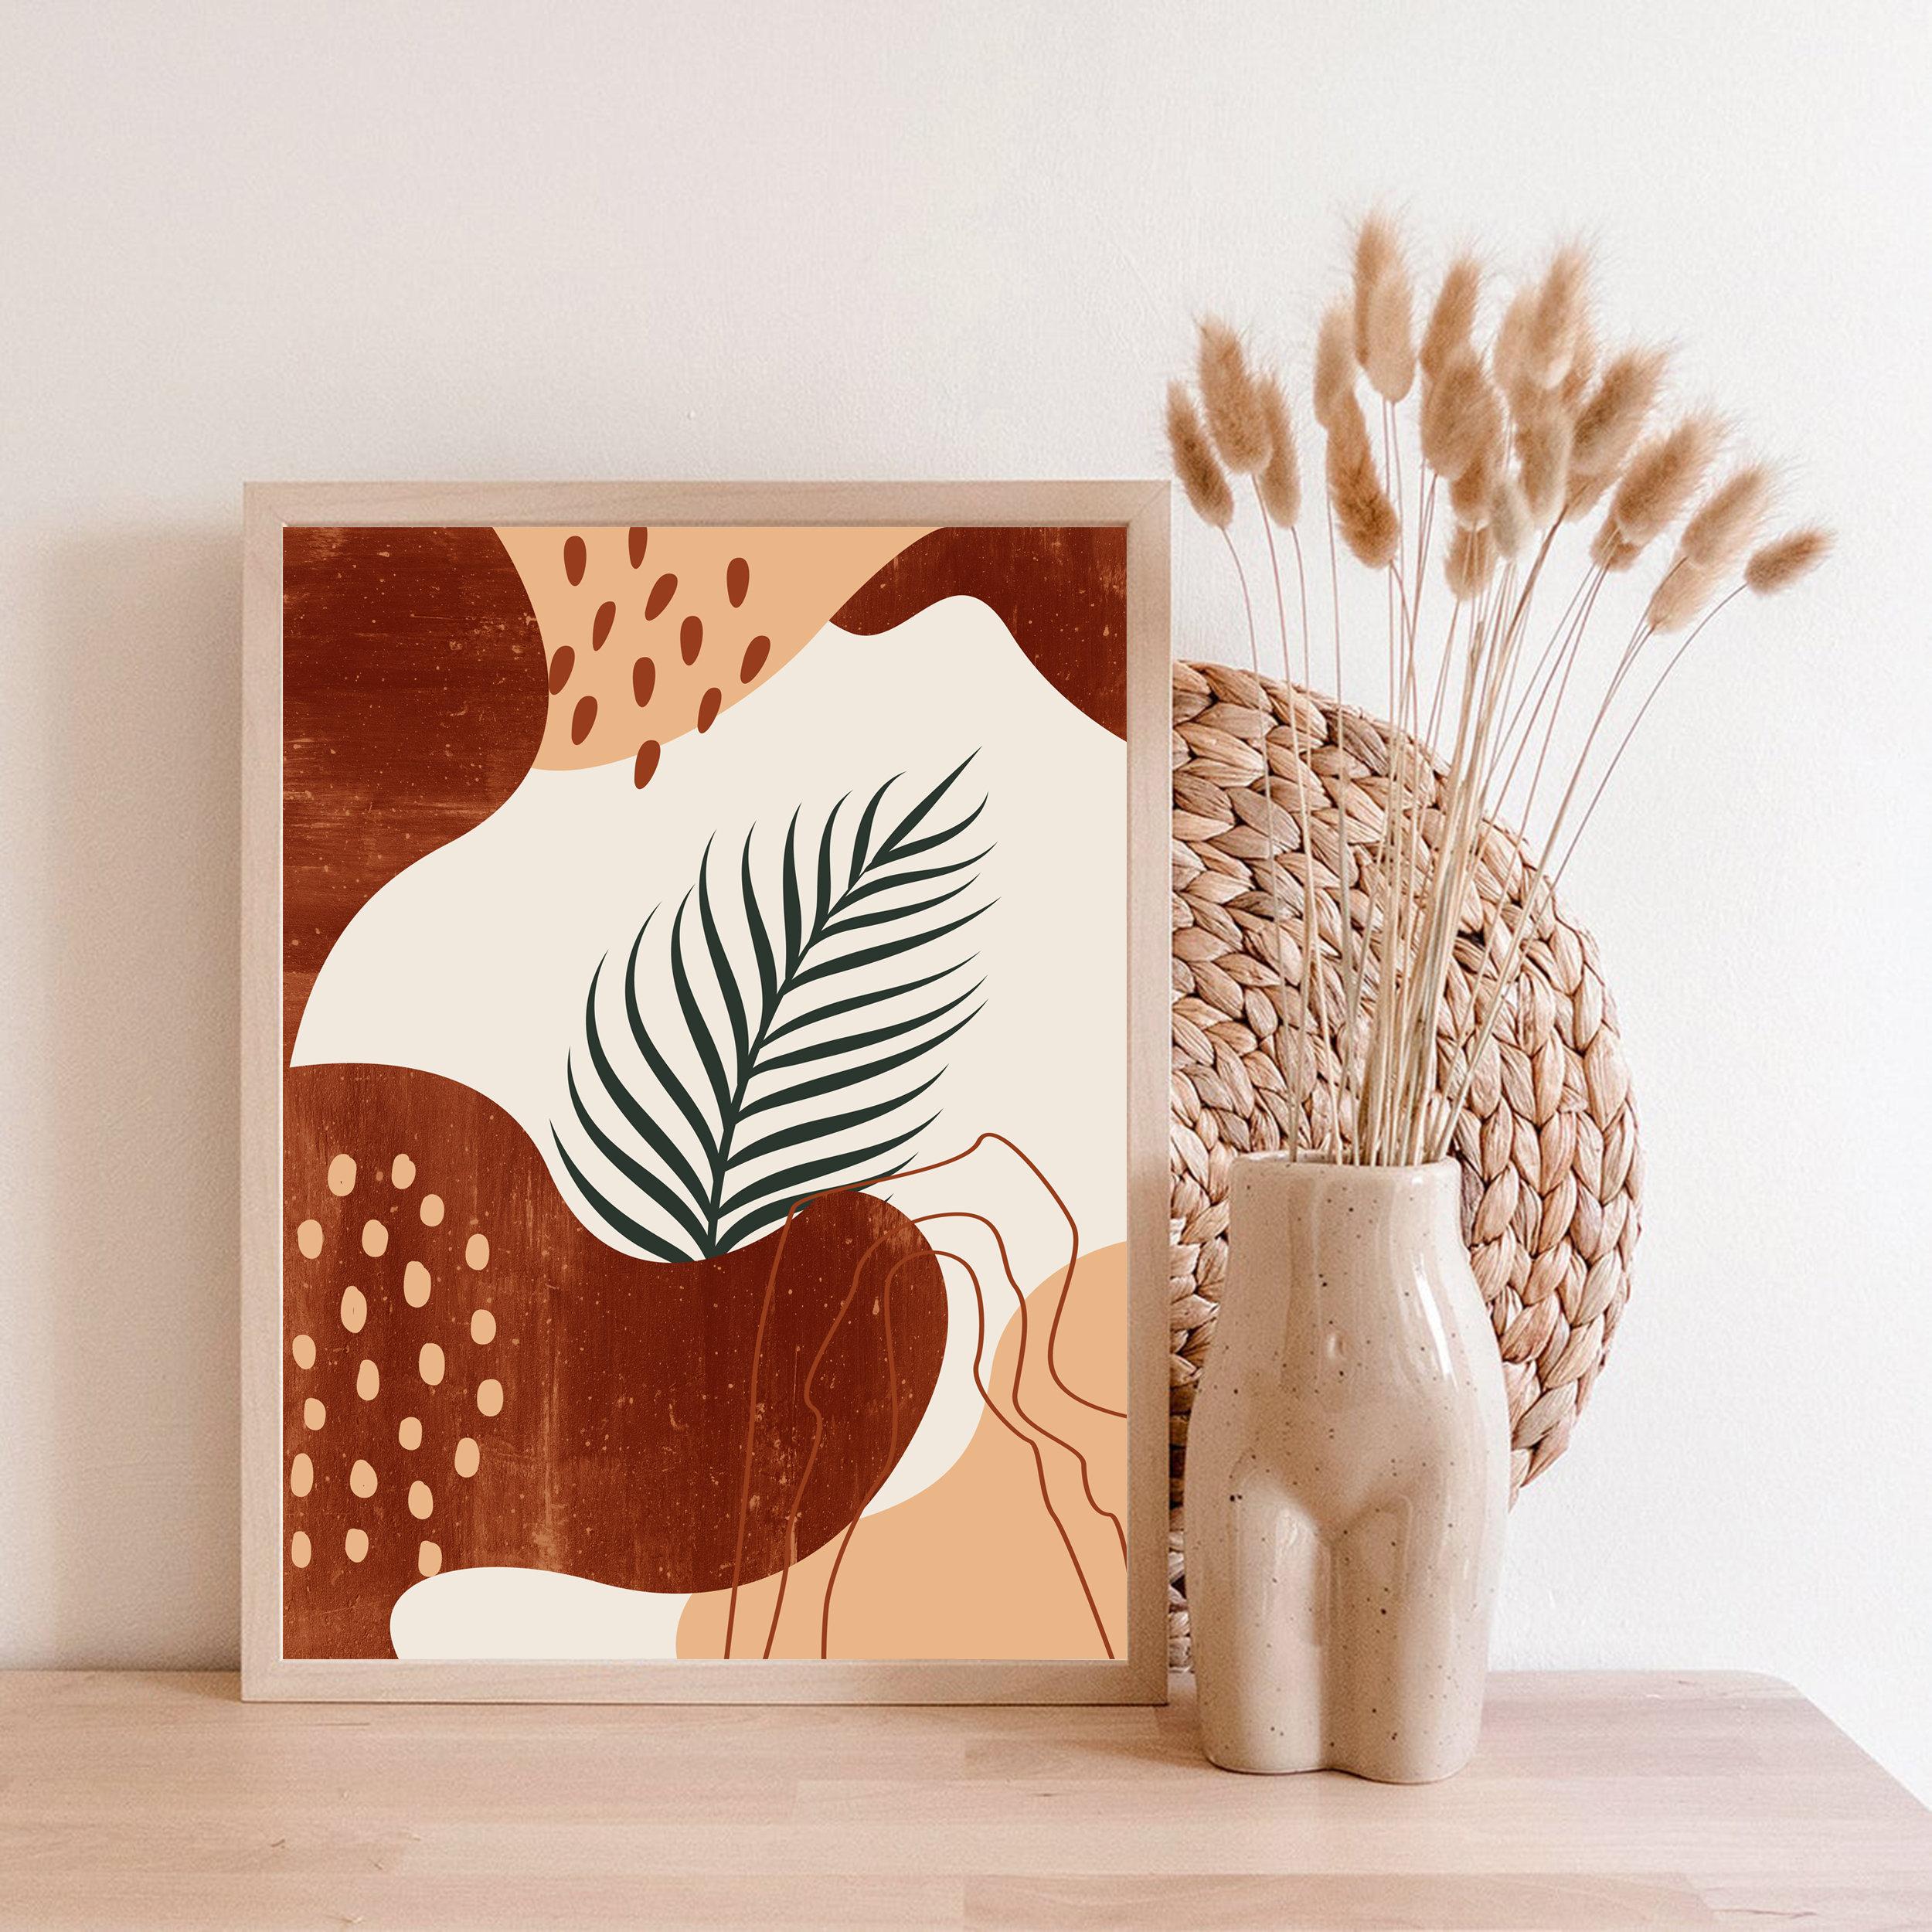 Abstract botanical wall art digital download file mid century modern boho  art, abstract shape home decor, printable art for living room